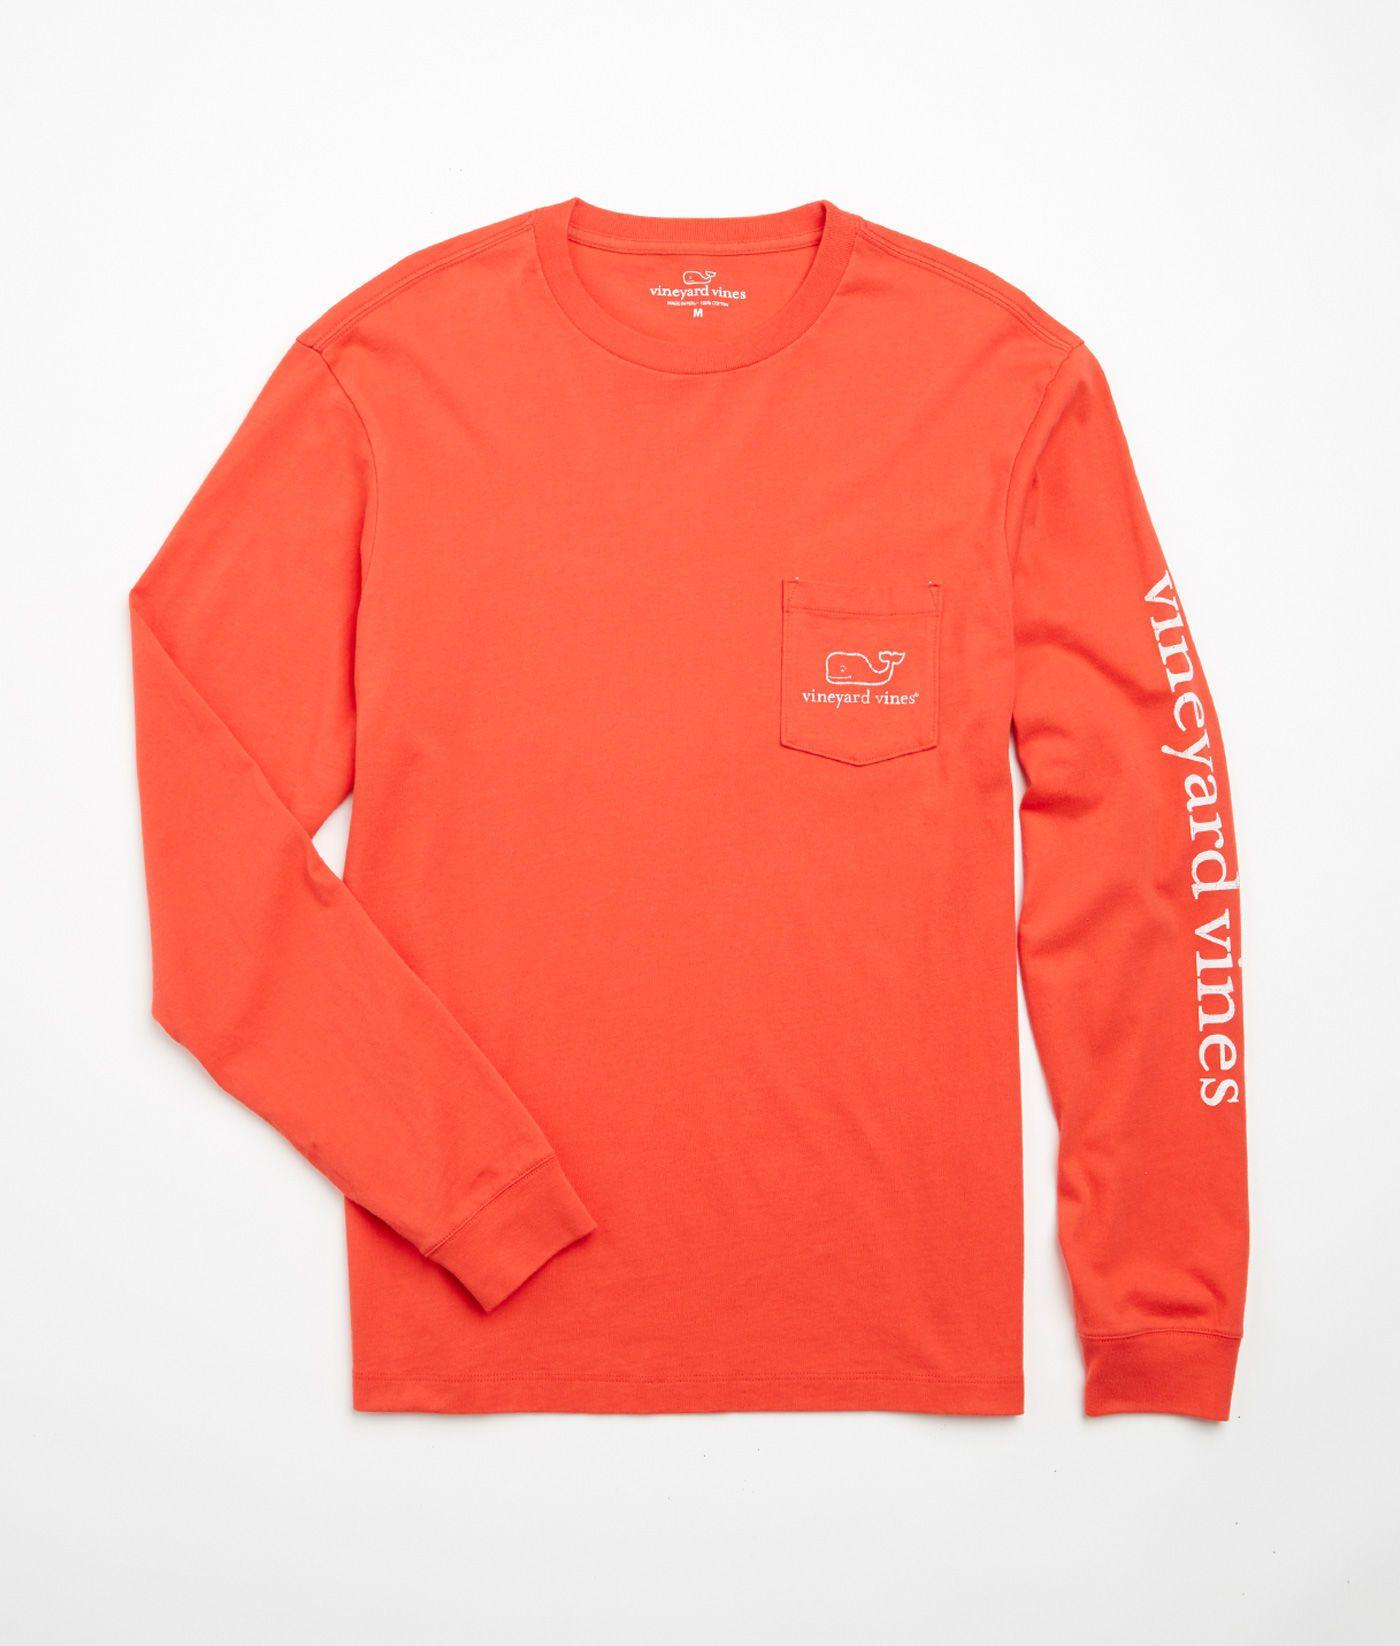 6dead18e9 Shop Boys Long-Sleeve Vintage Whale Graphic T-Shirt at vineyard vines